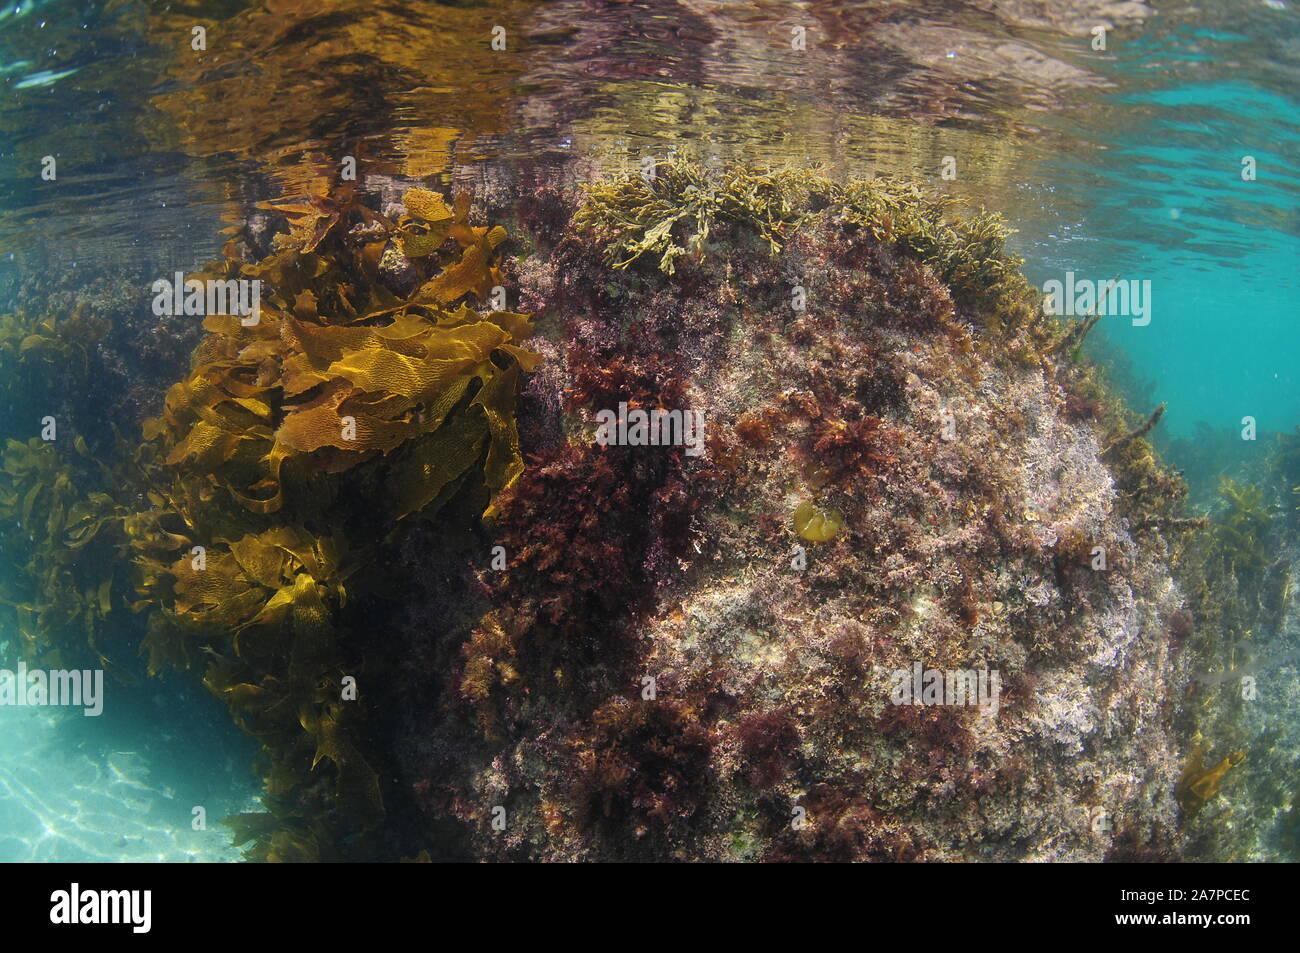 Underwater rock covered with various short seaweeds and brown stalked kelp breaking calm ocean surface. Stock Photo